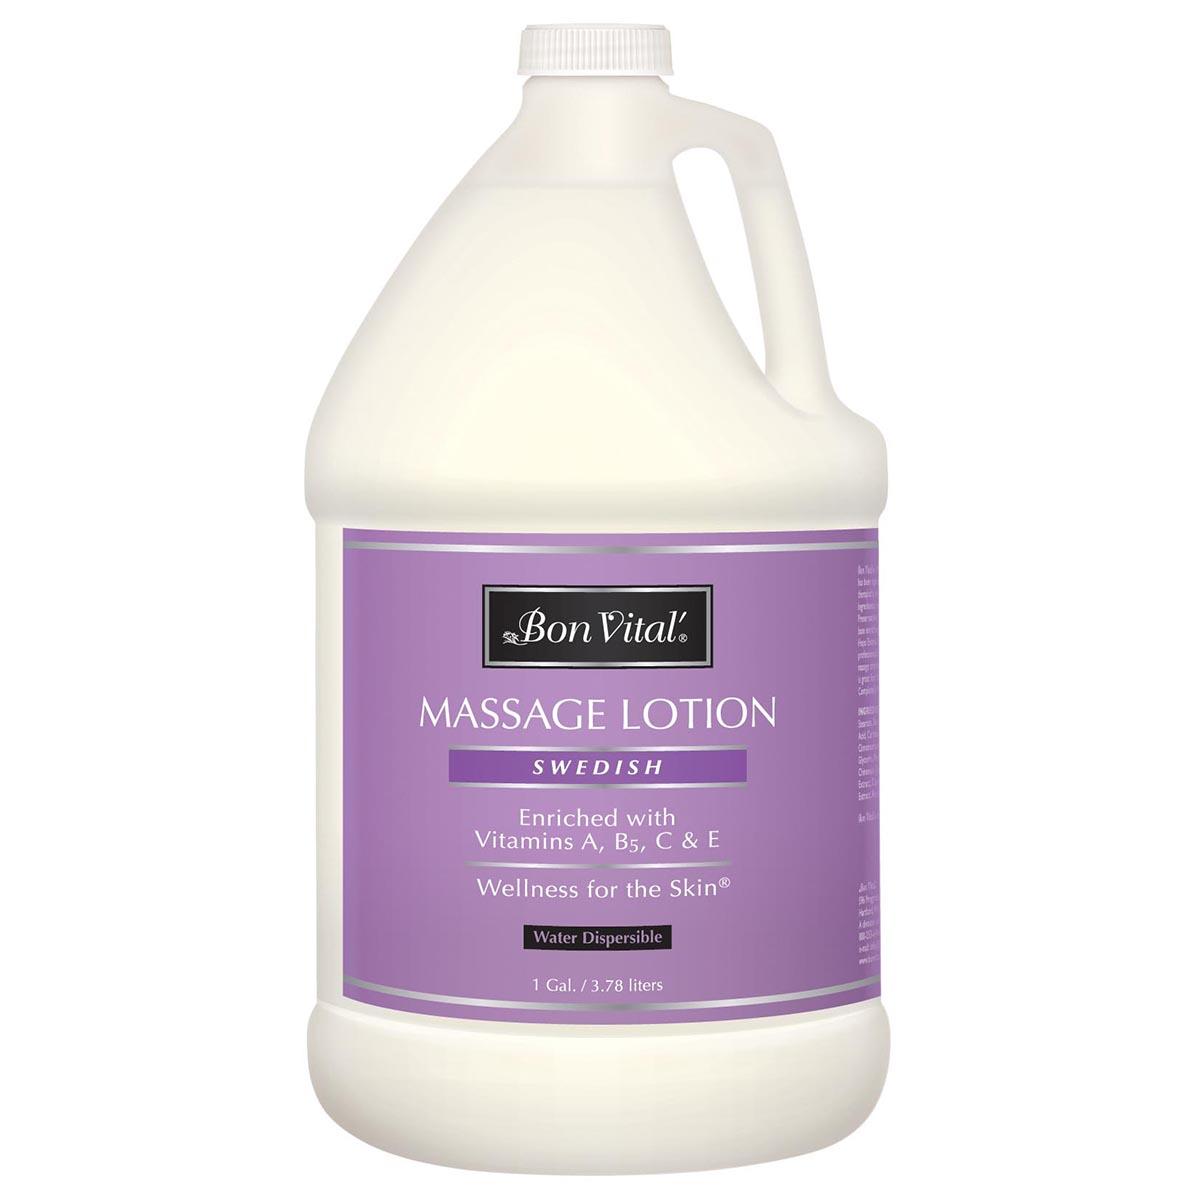 Bon Vital Swedish Massage Lotion Massage Lotions Oils